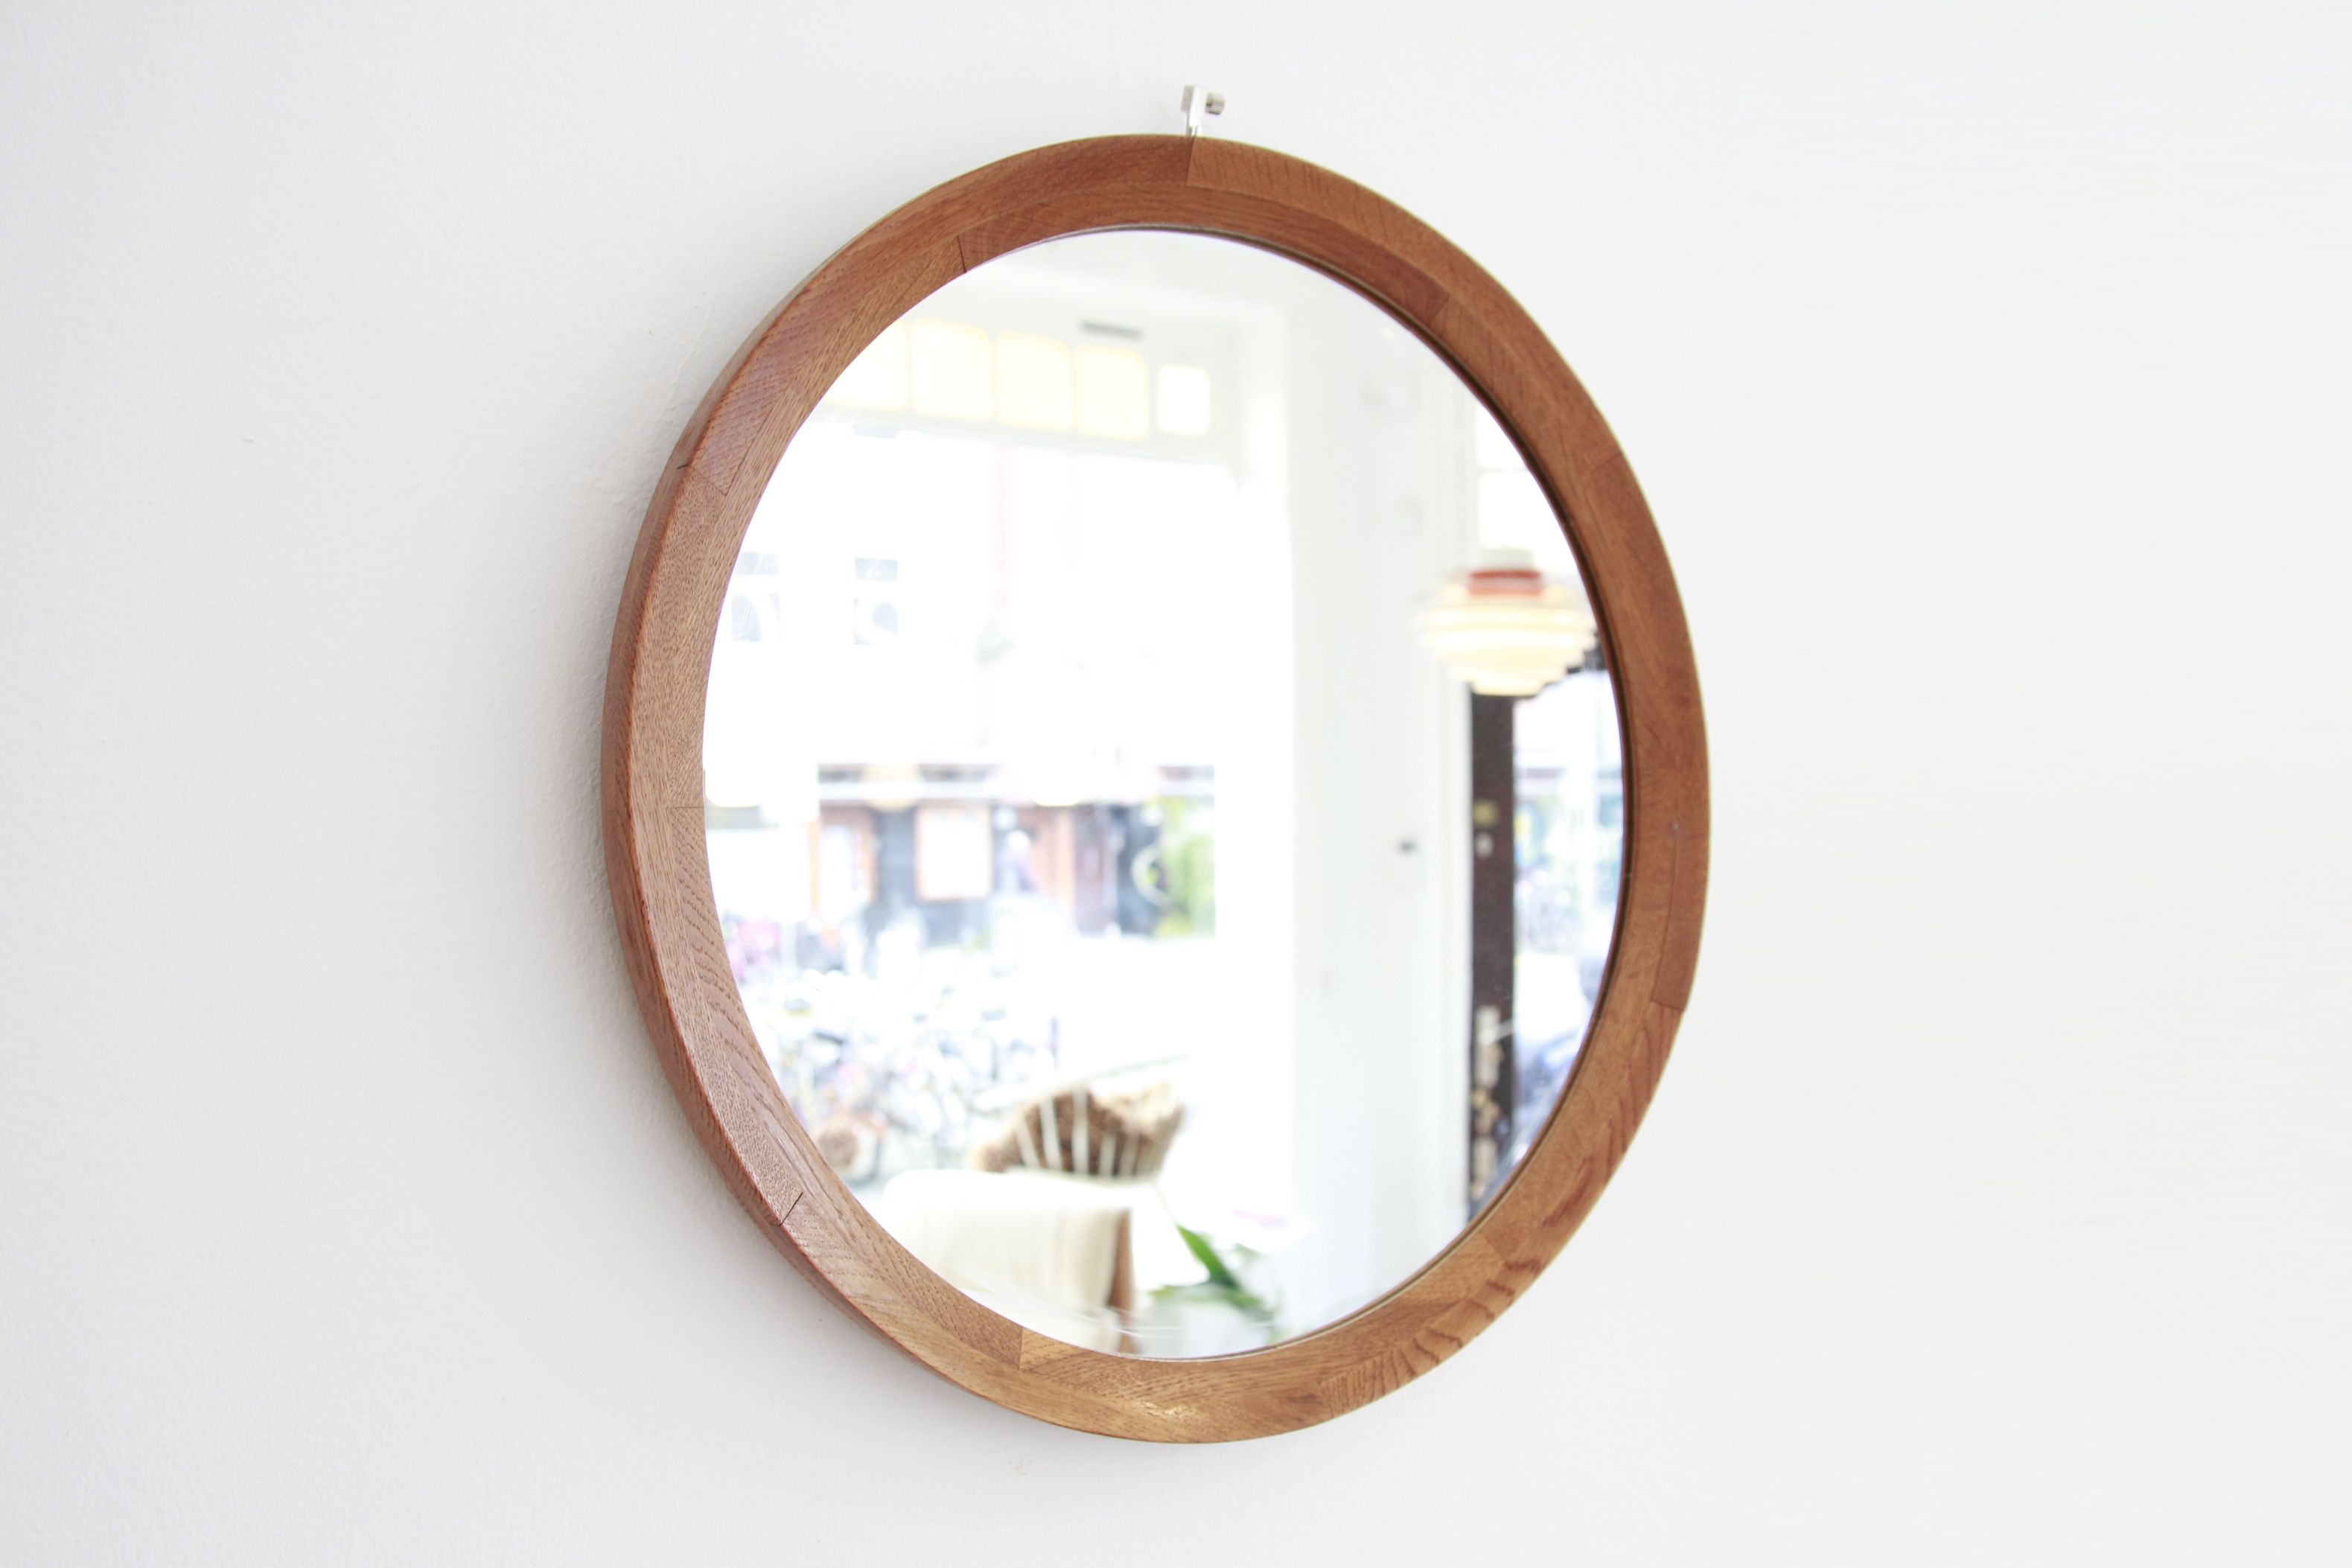 Ronde Houten Spiegel : Ronde massief eiken houten deens design spiegel van ons vintage